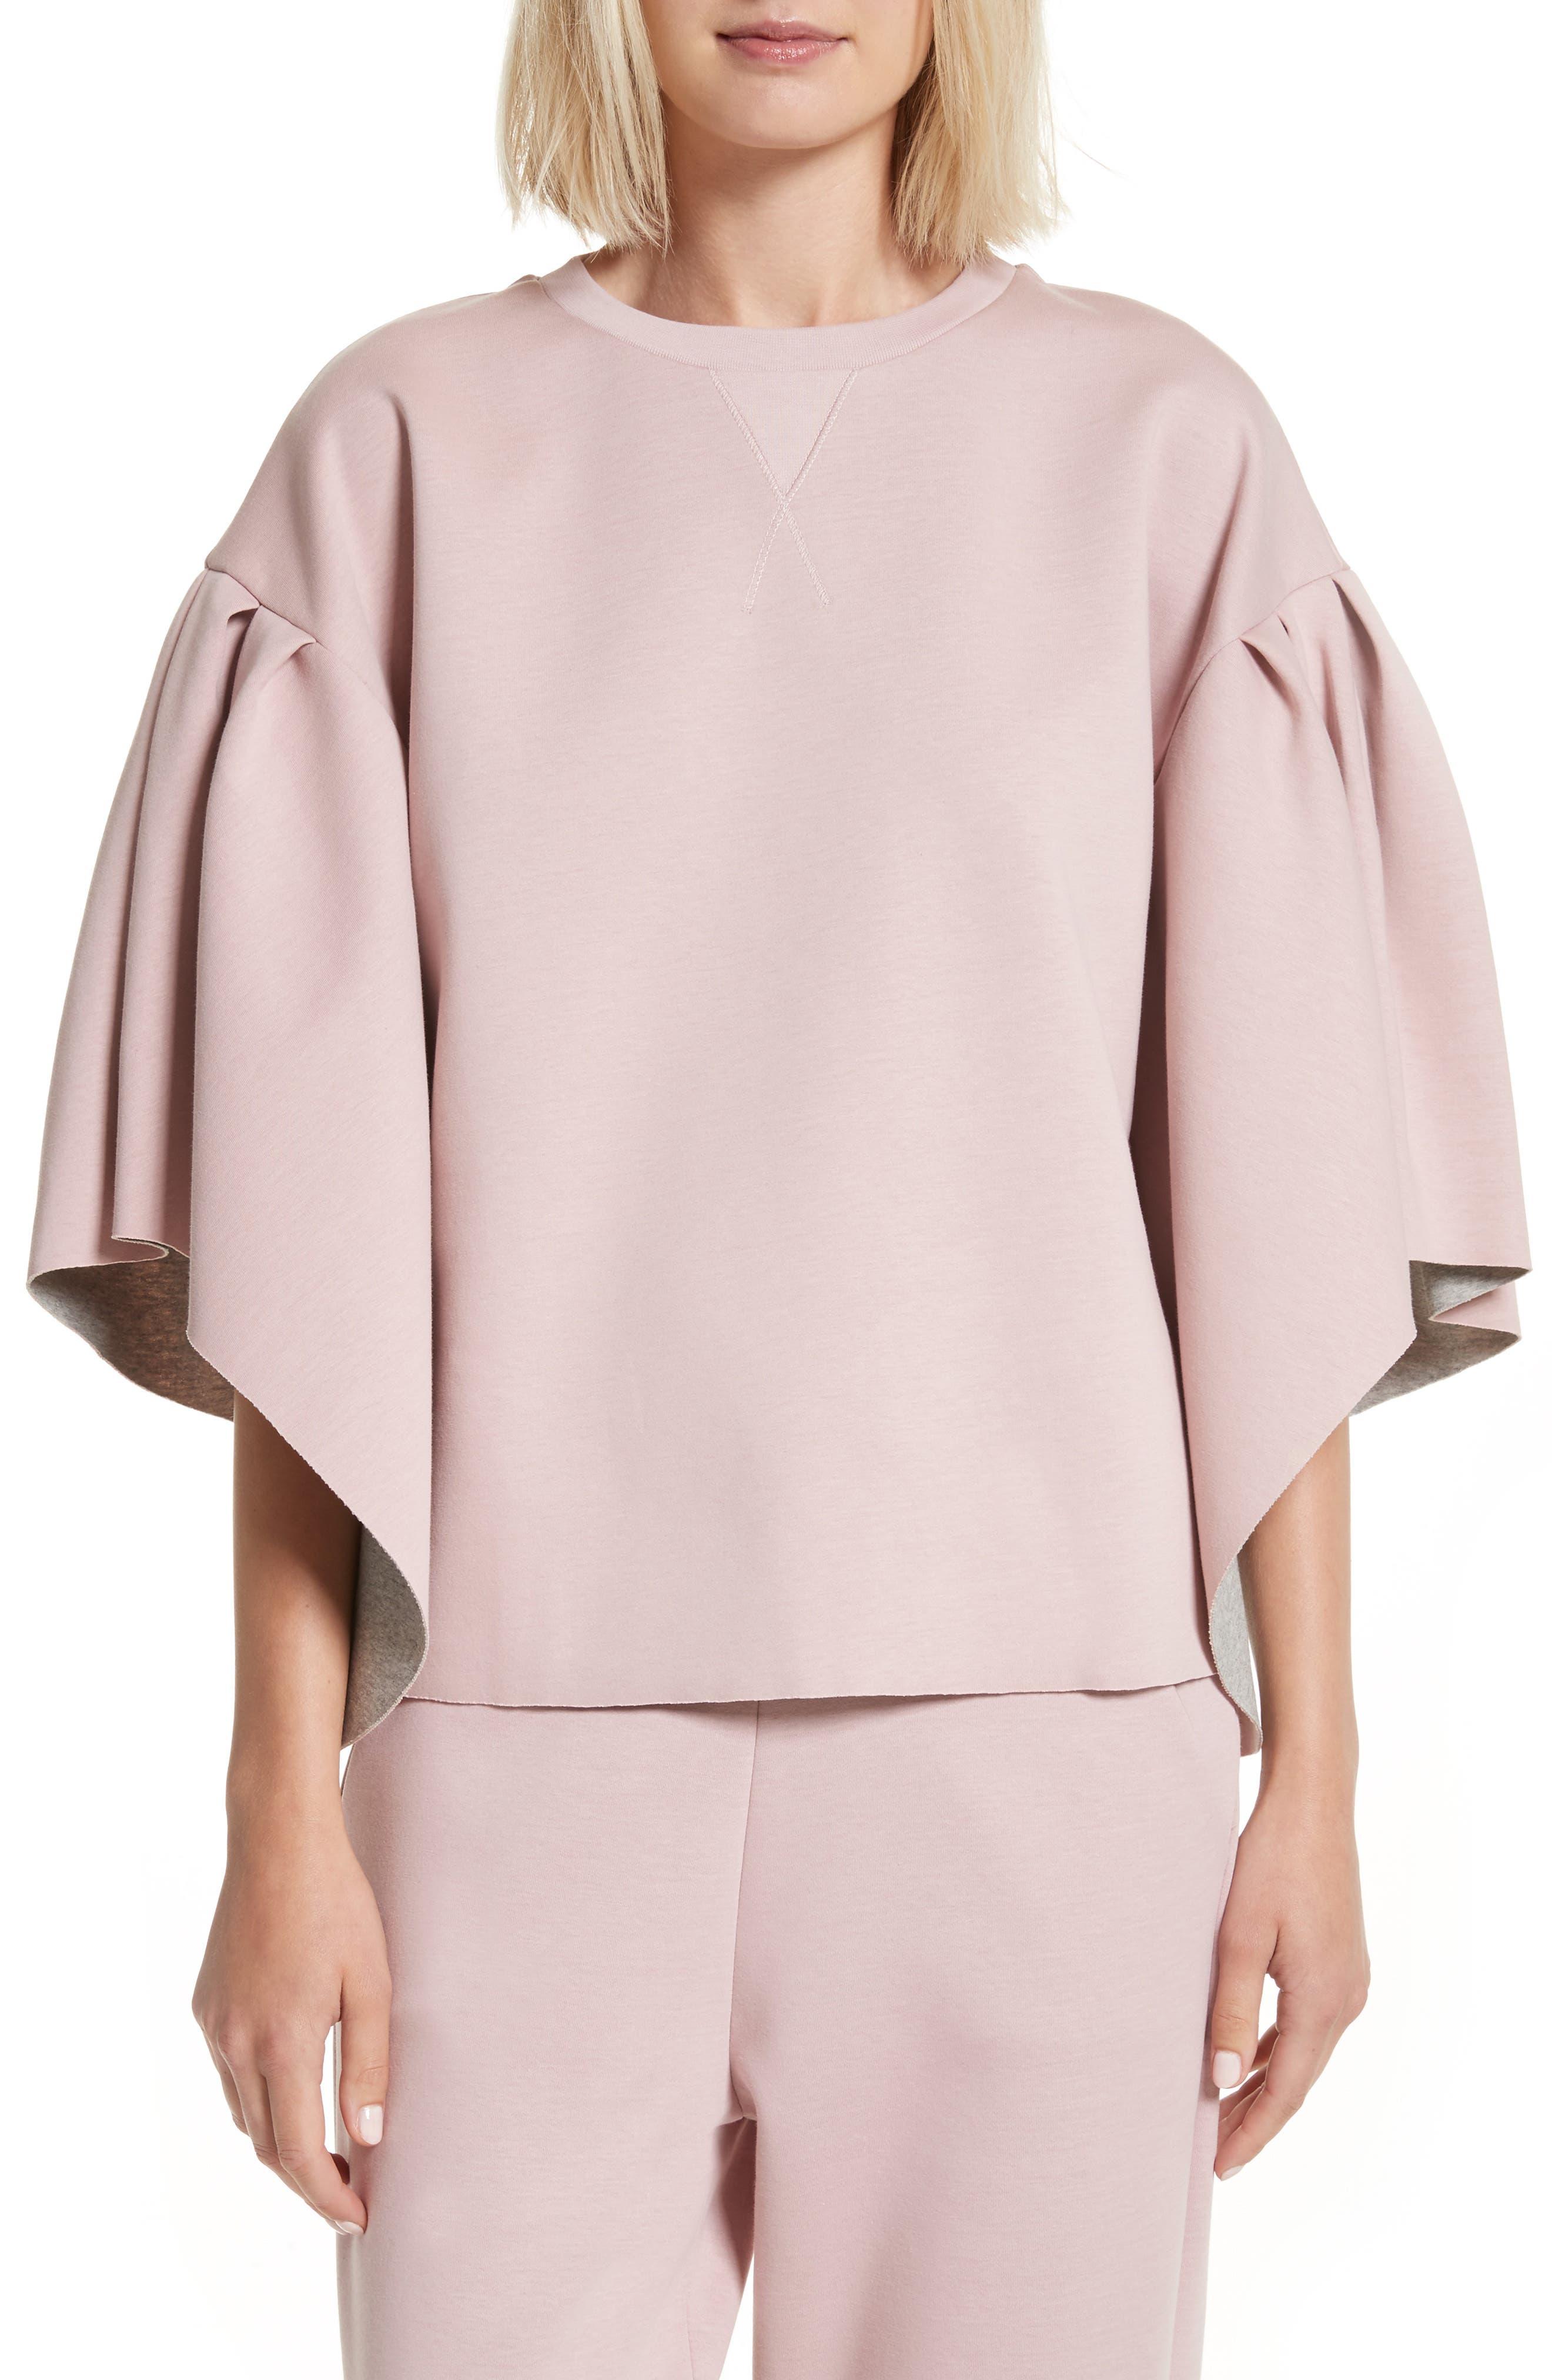 Orcher Full Sleeve Sweatshirt,                         Main,                         color, Dusky Pink